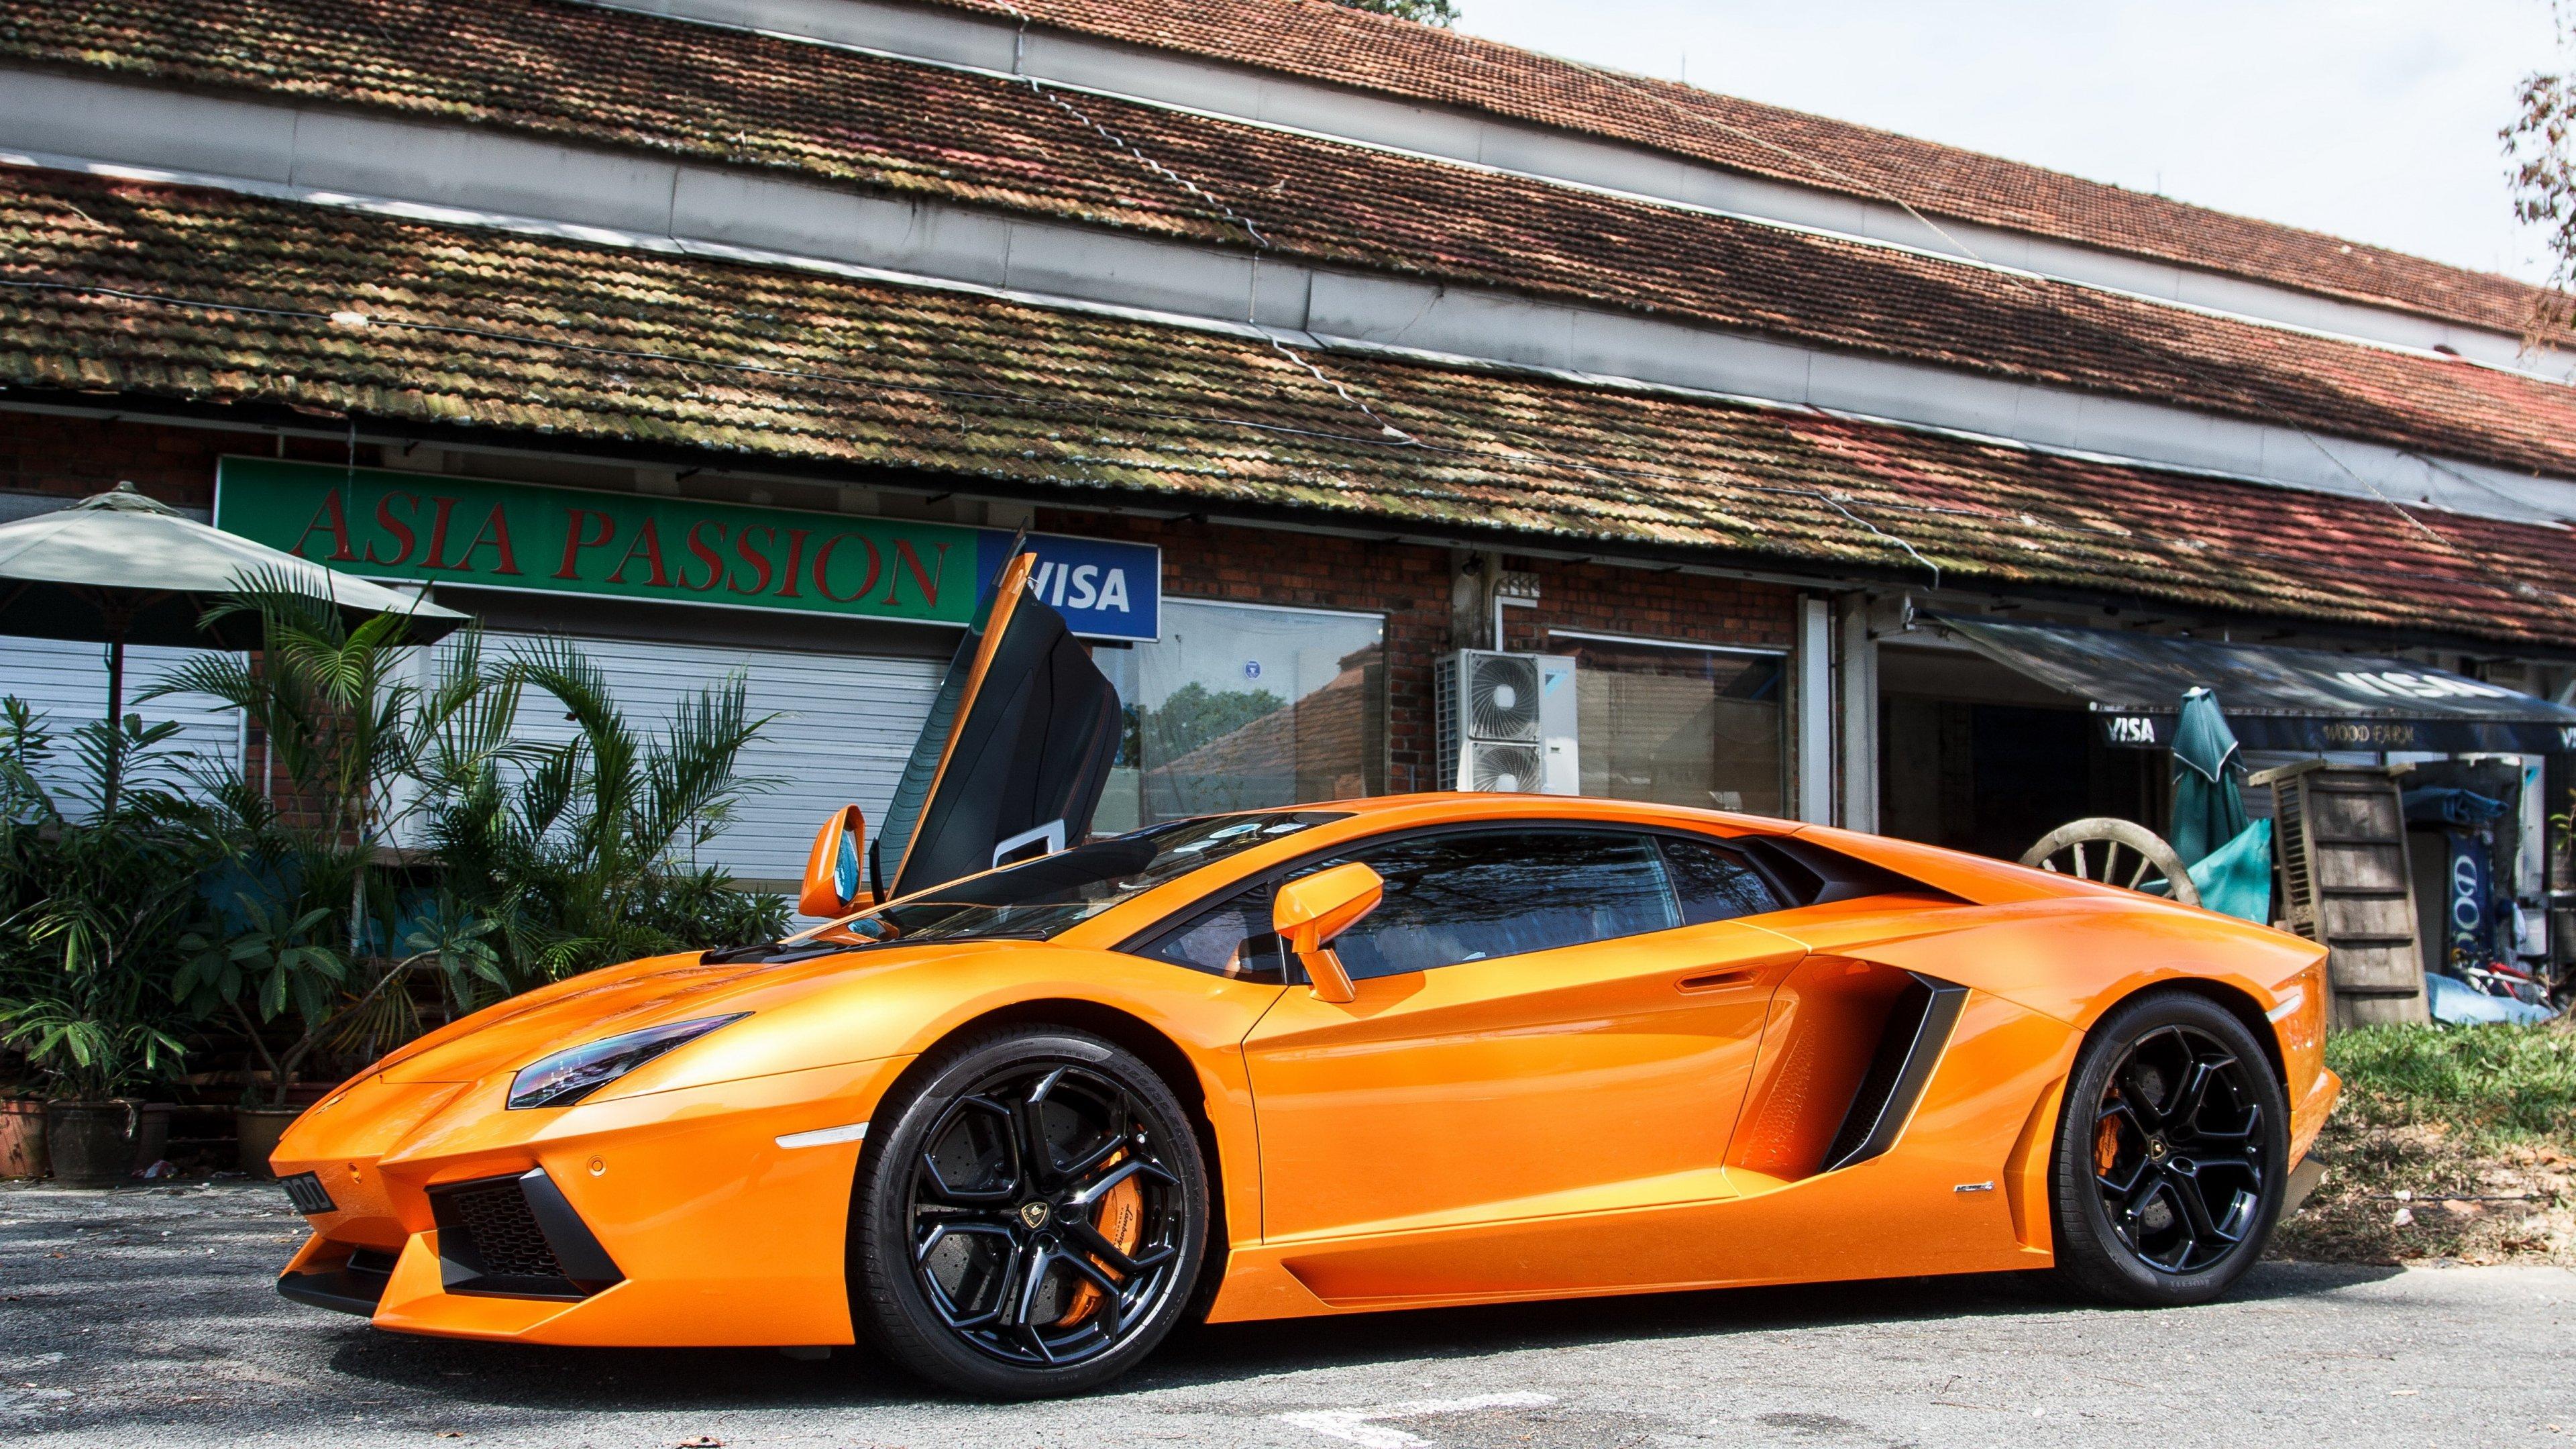 Free Download Ultra Hd 4k Cars Wallpapers Desktop Backgrounds Hd